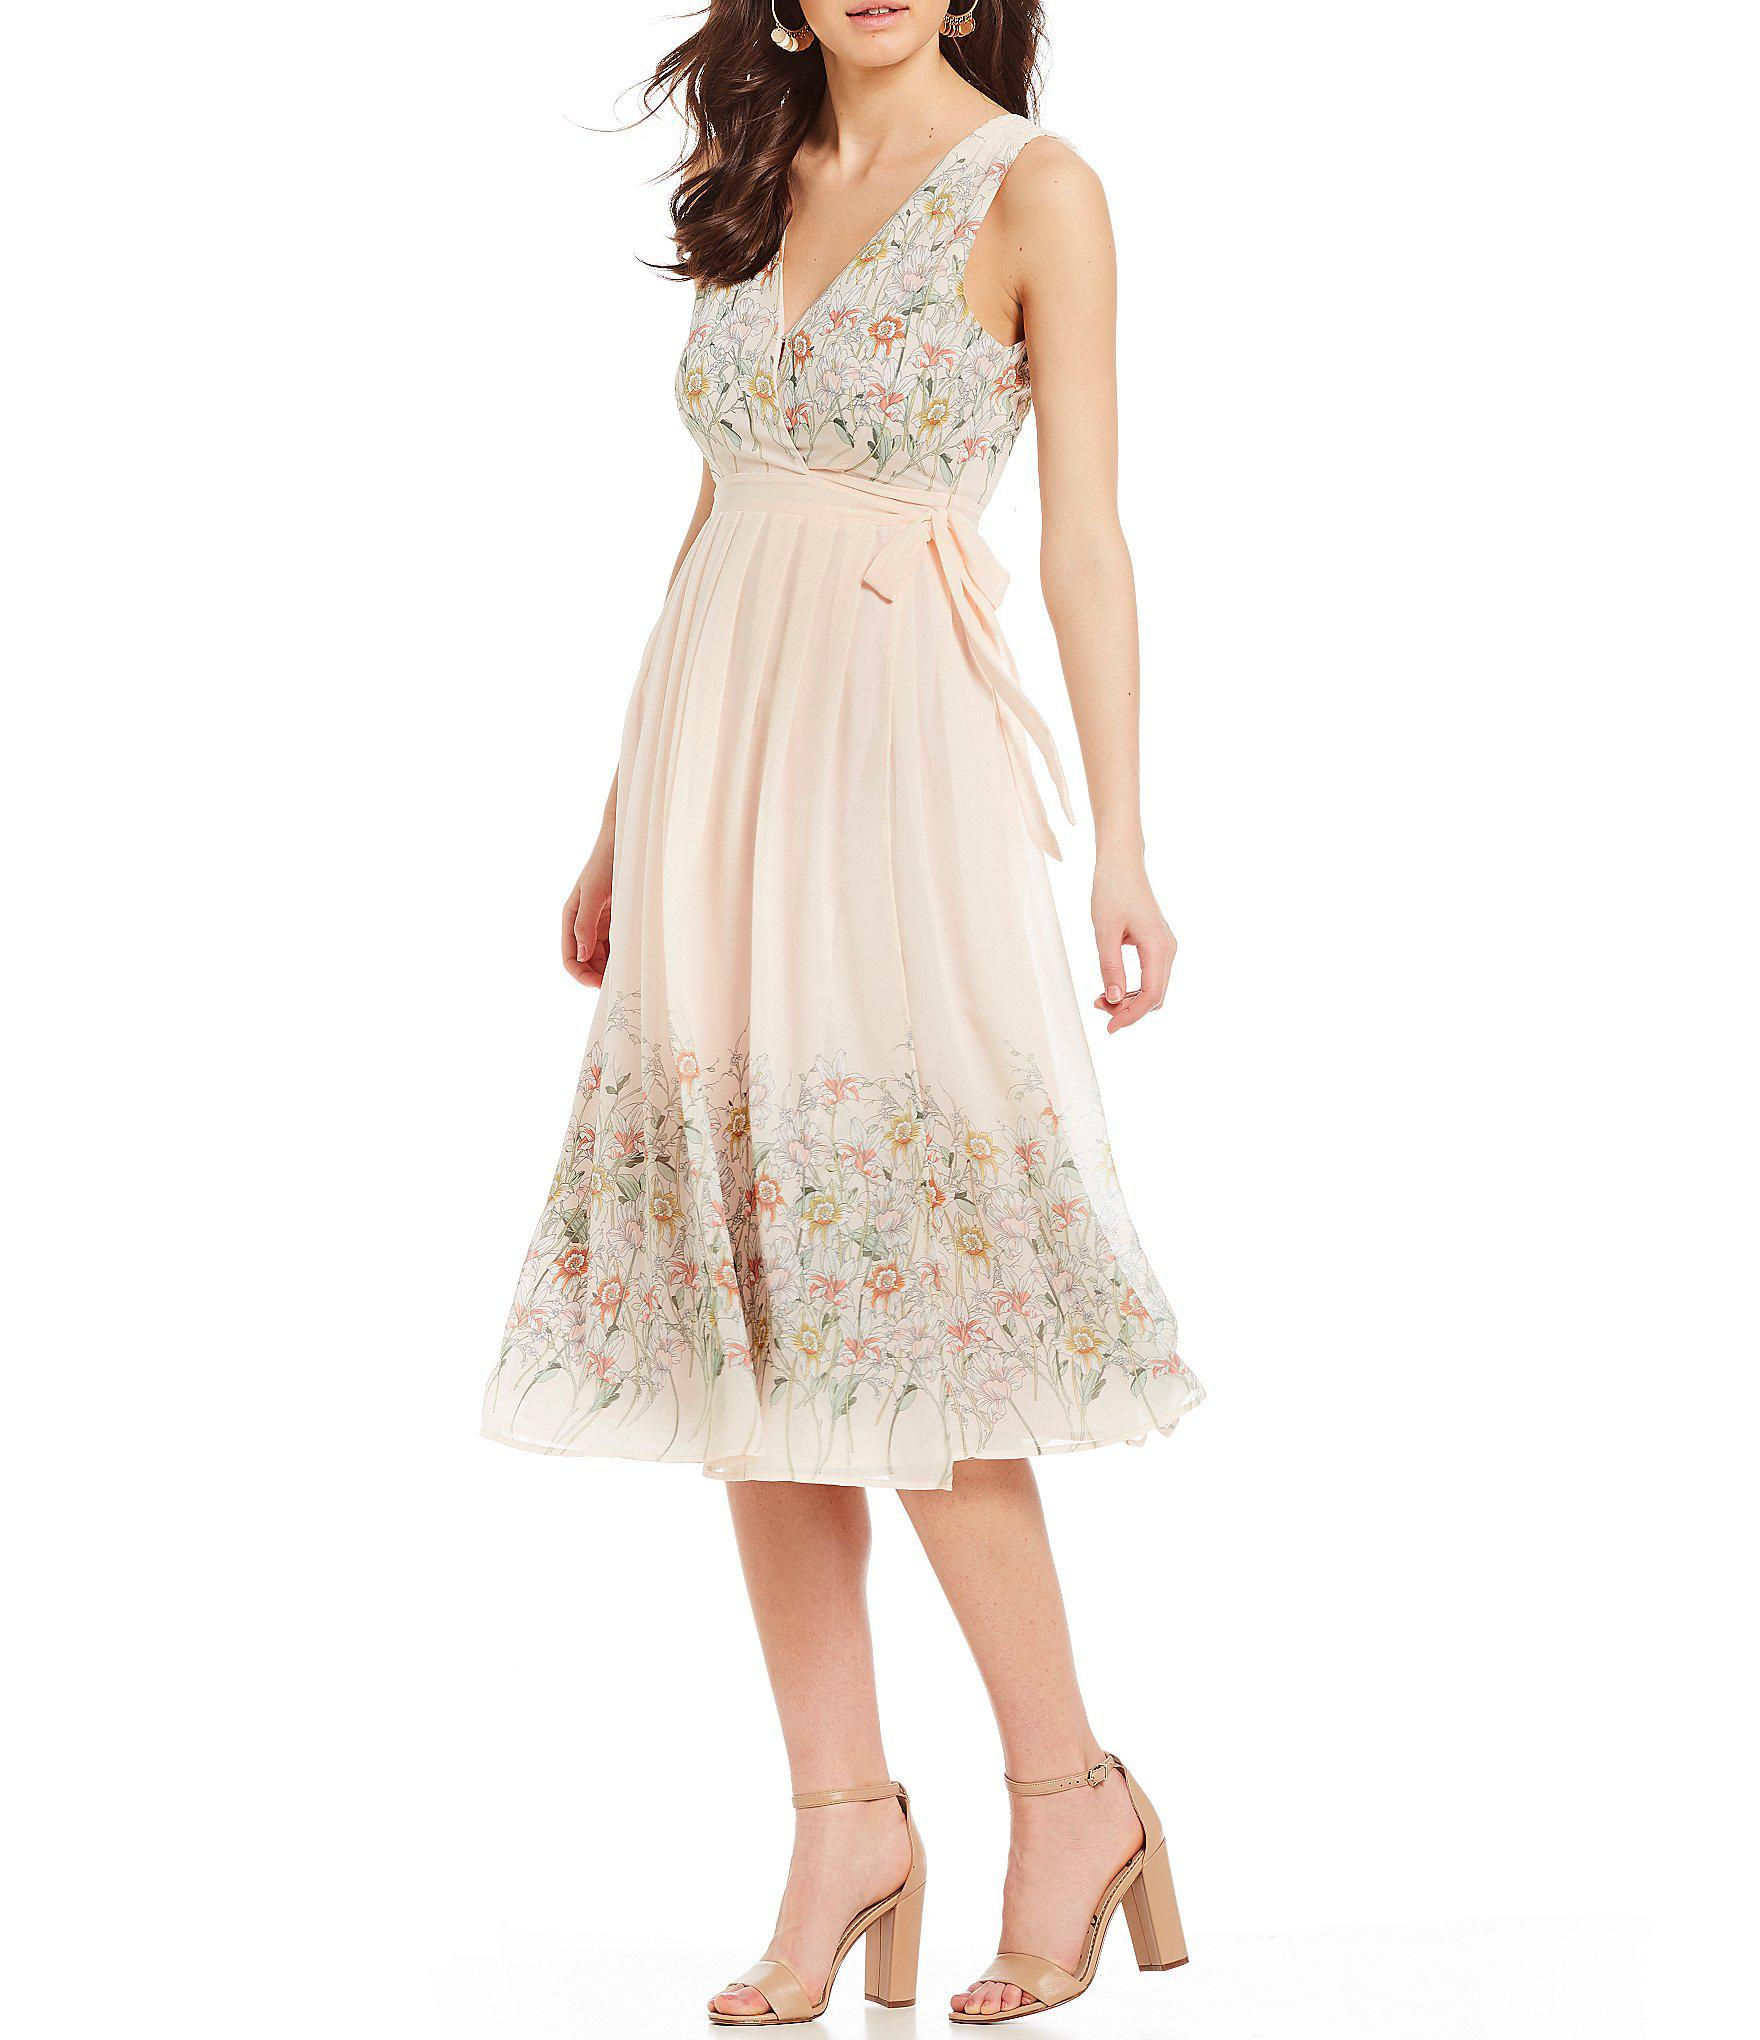 7506a4836ea7 Astr Bristol Floral Print A-line Midi Dress - Lyst